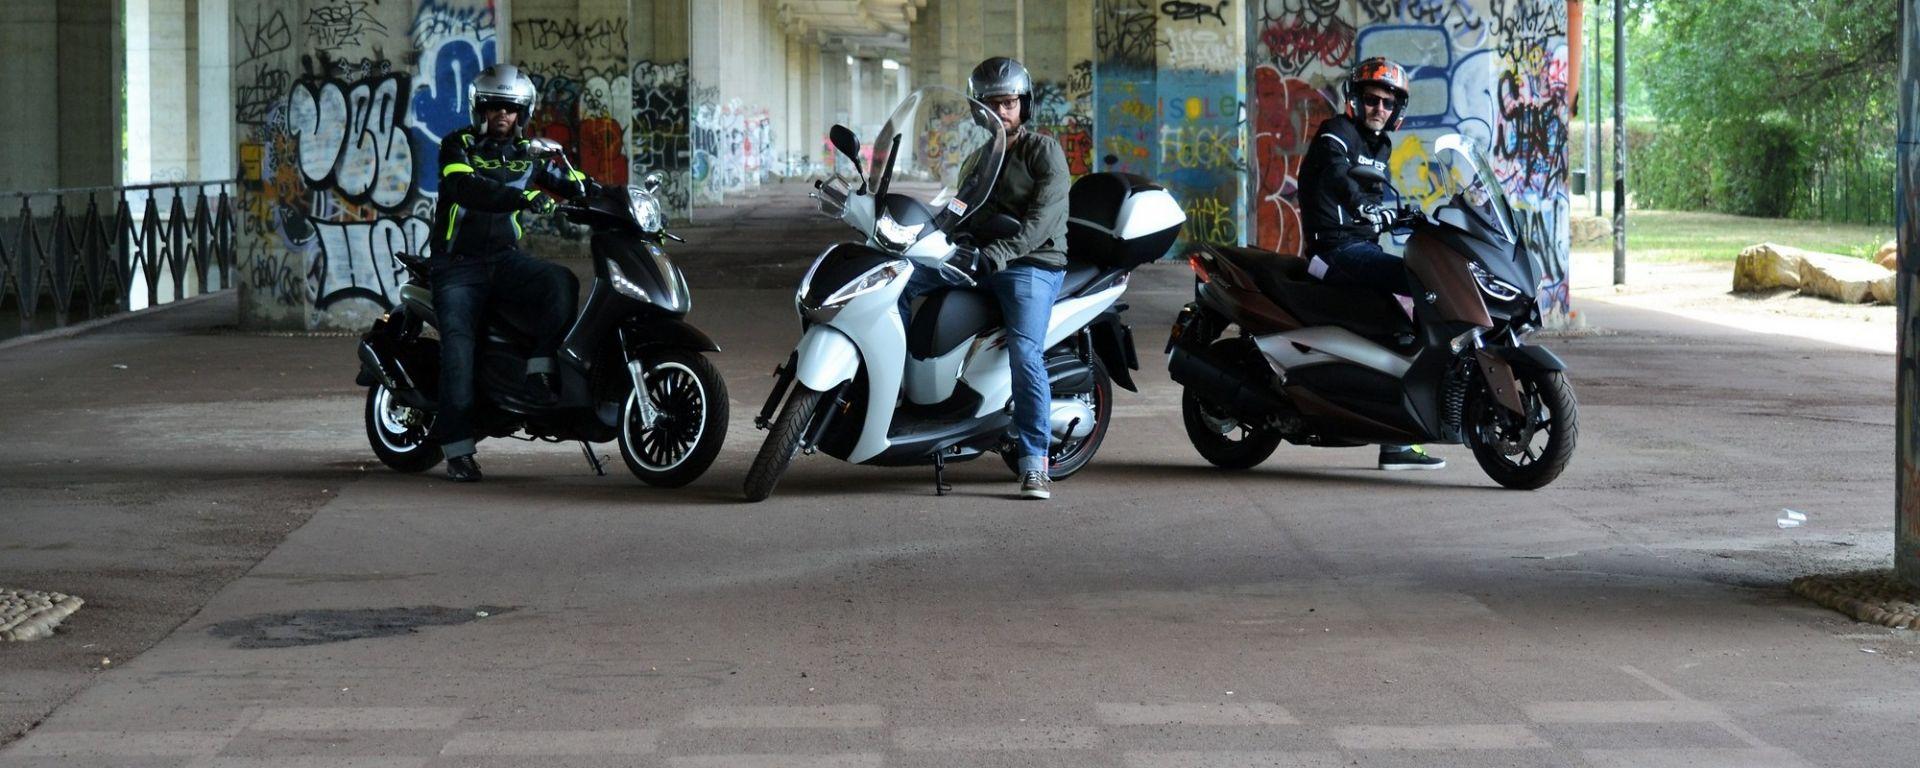 Honda SH300i, Piaggio Beverly 300, Yamaha Xmax 300: la prova confronto